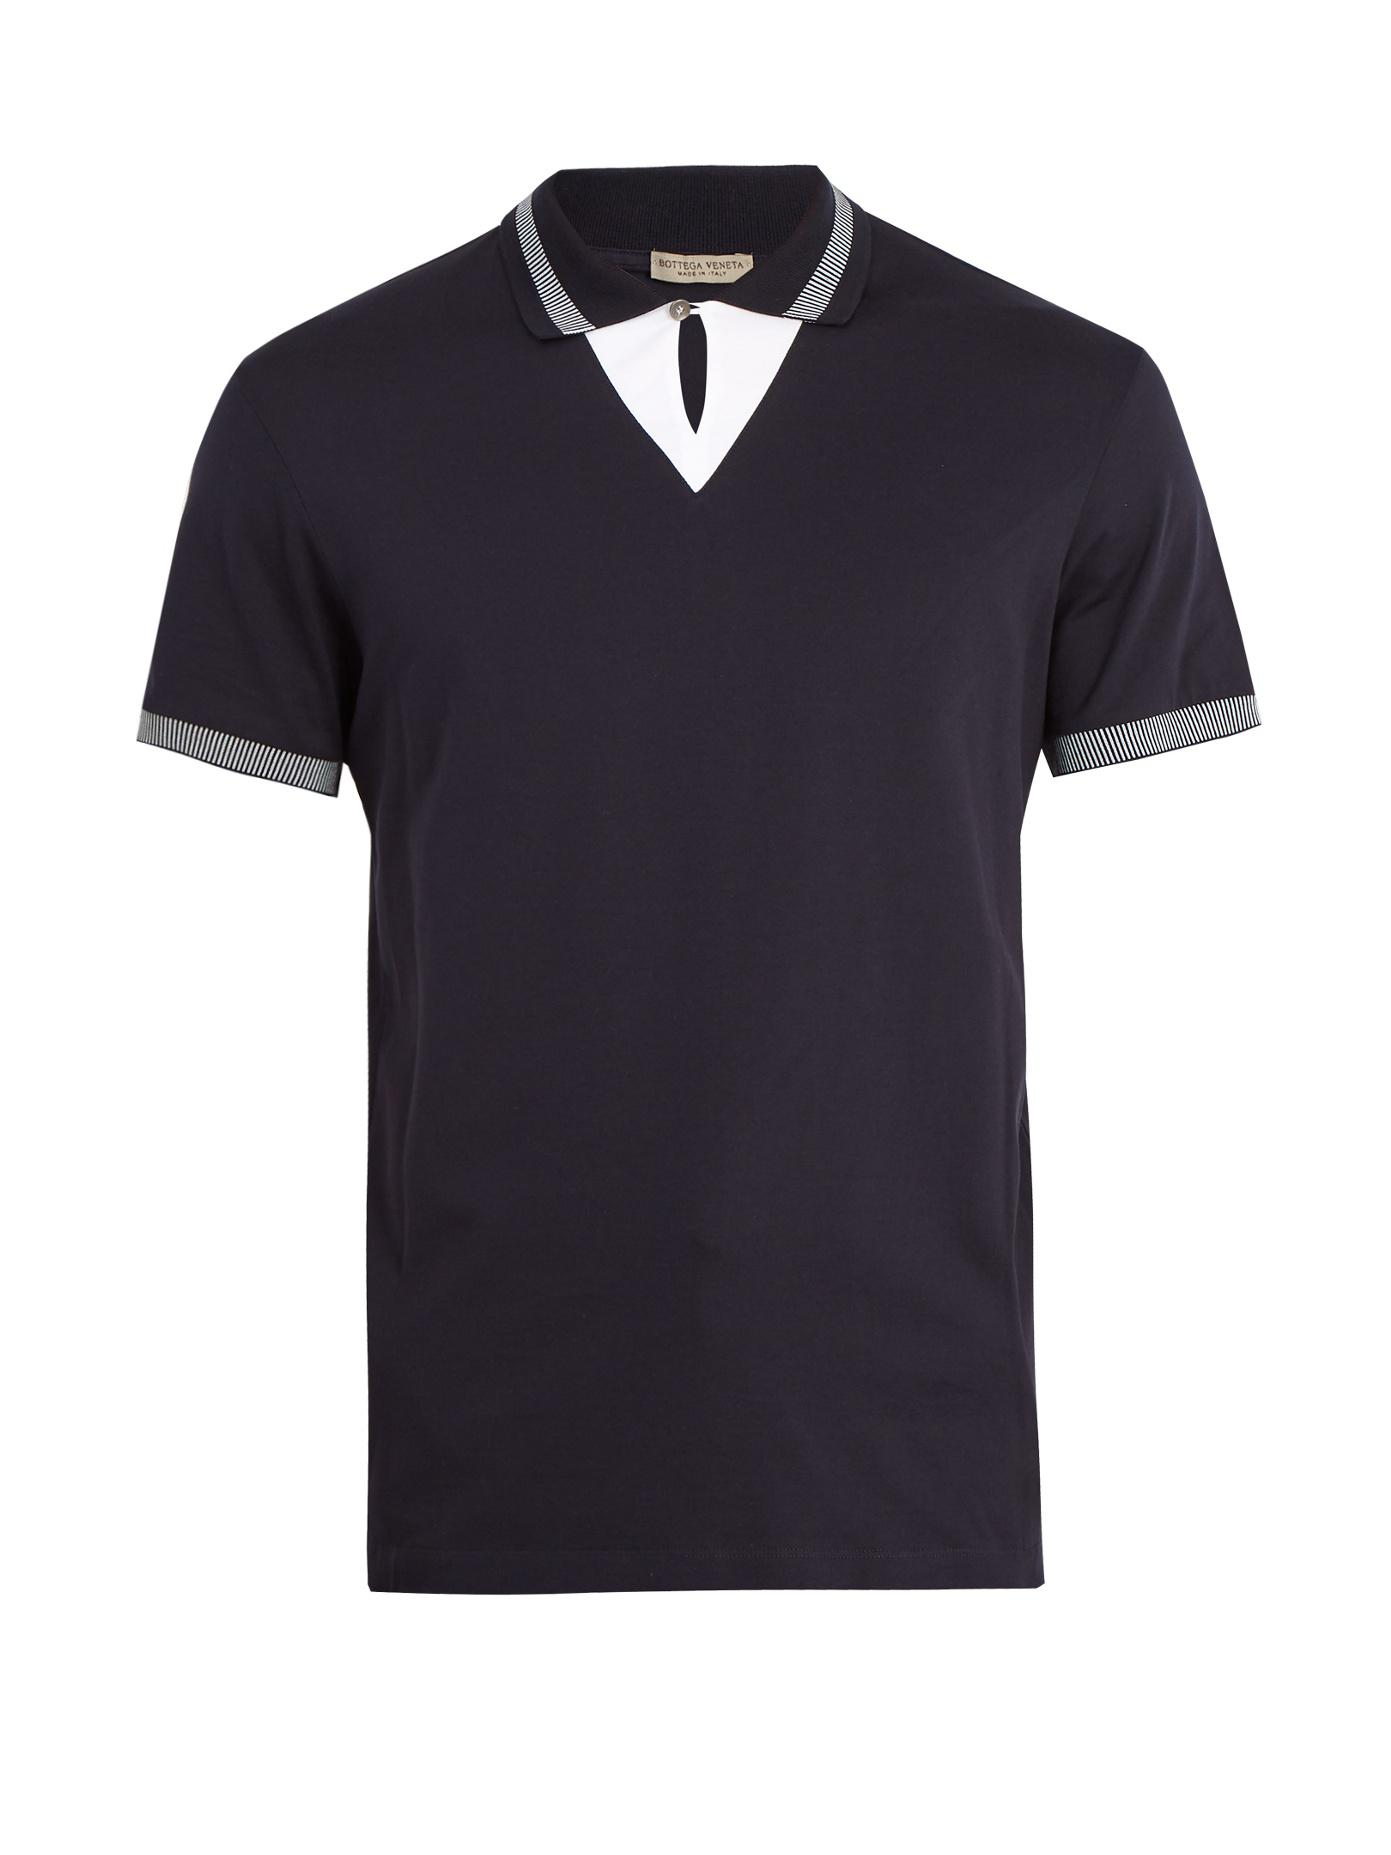 Contrast-collar silk-piqué polo shirt Bottega Veneta 2018 New Sale Online 7BJUmfv